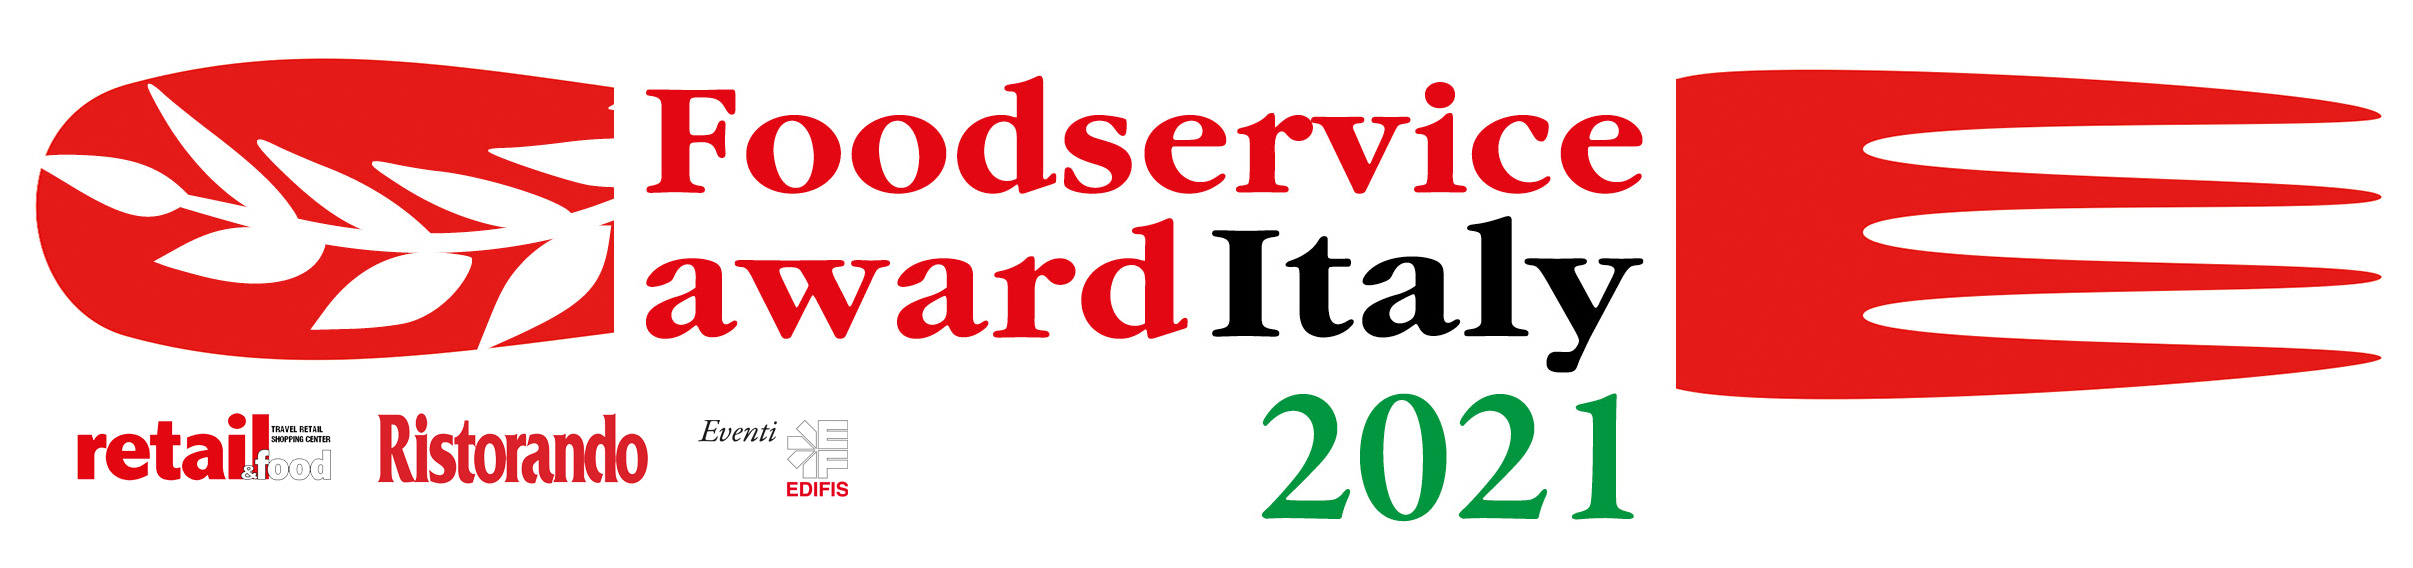 Foodservice Award